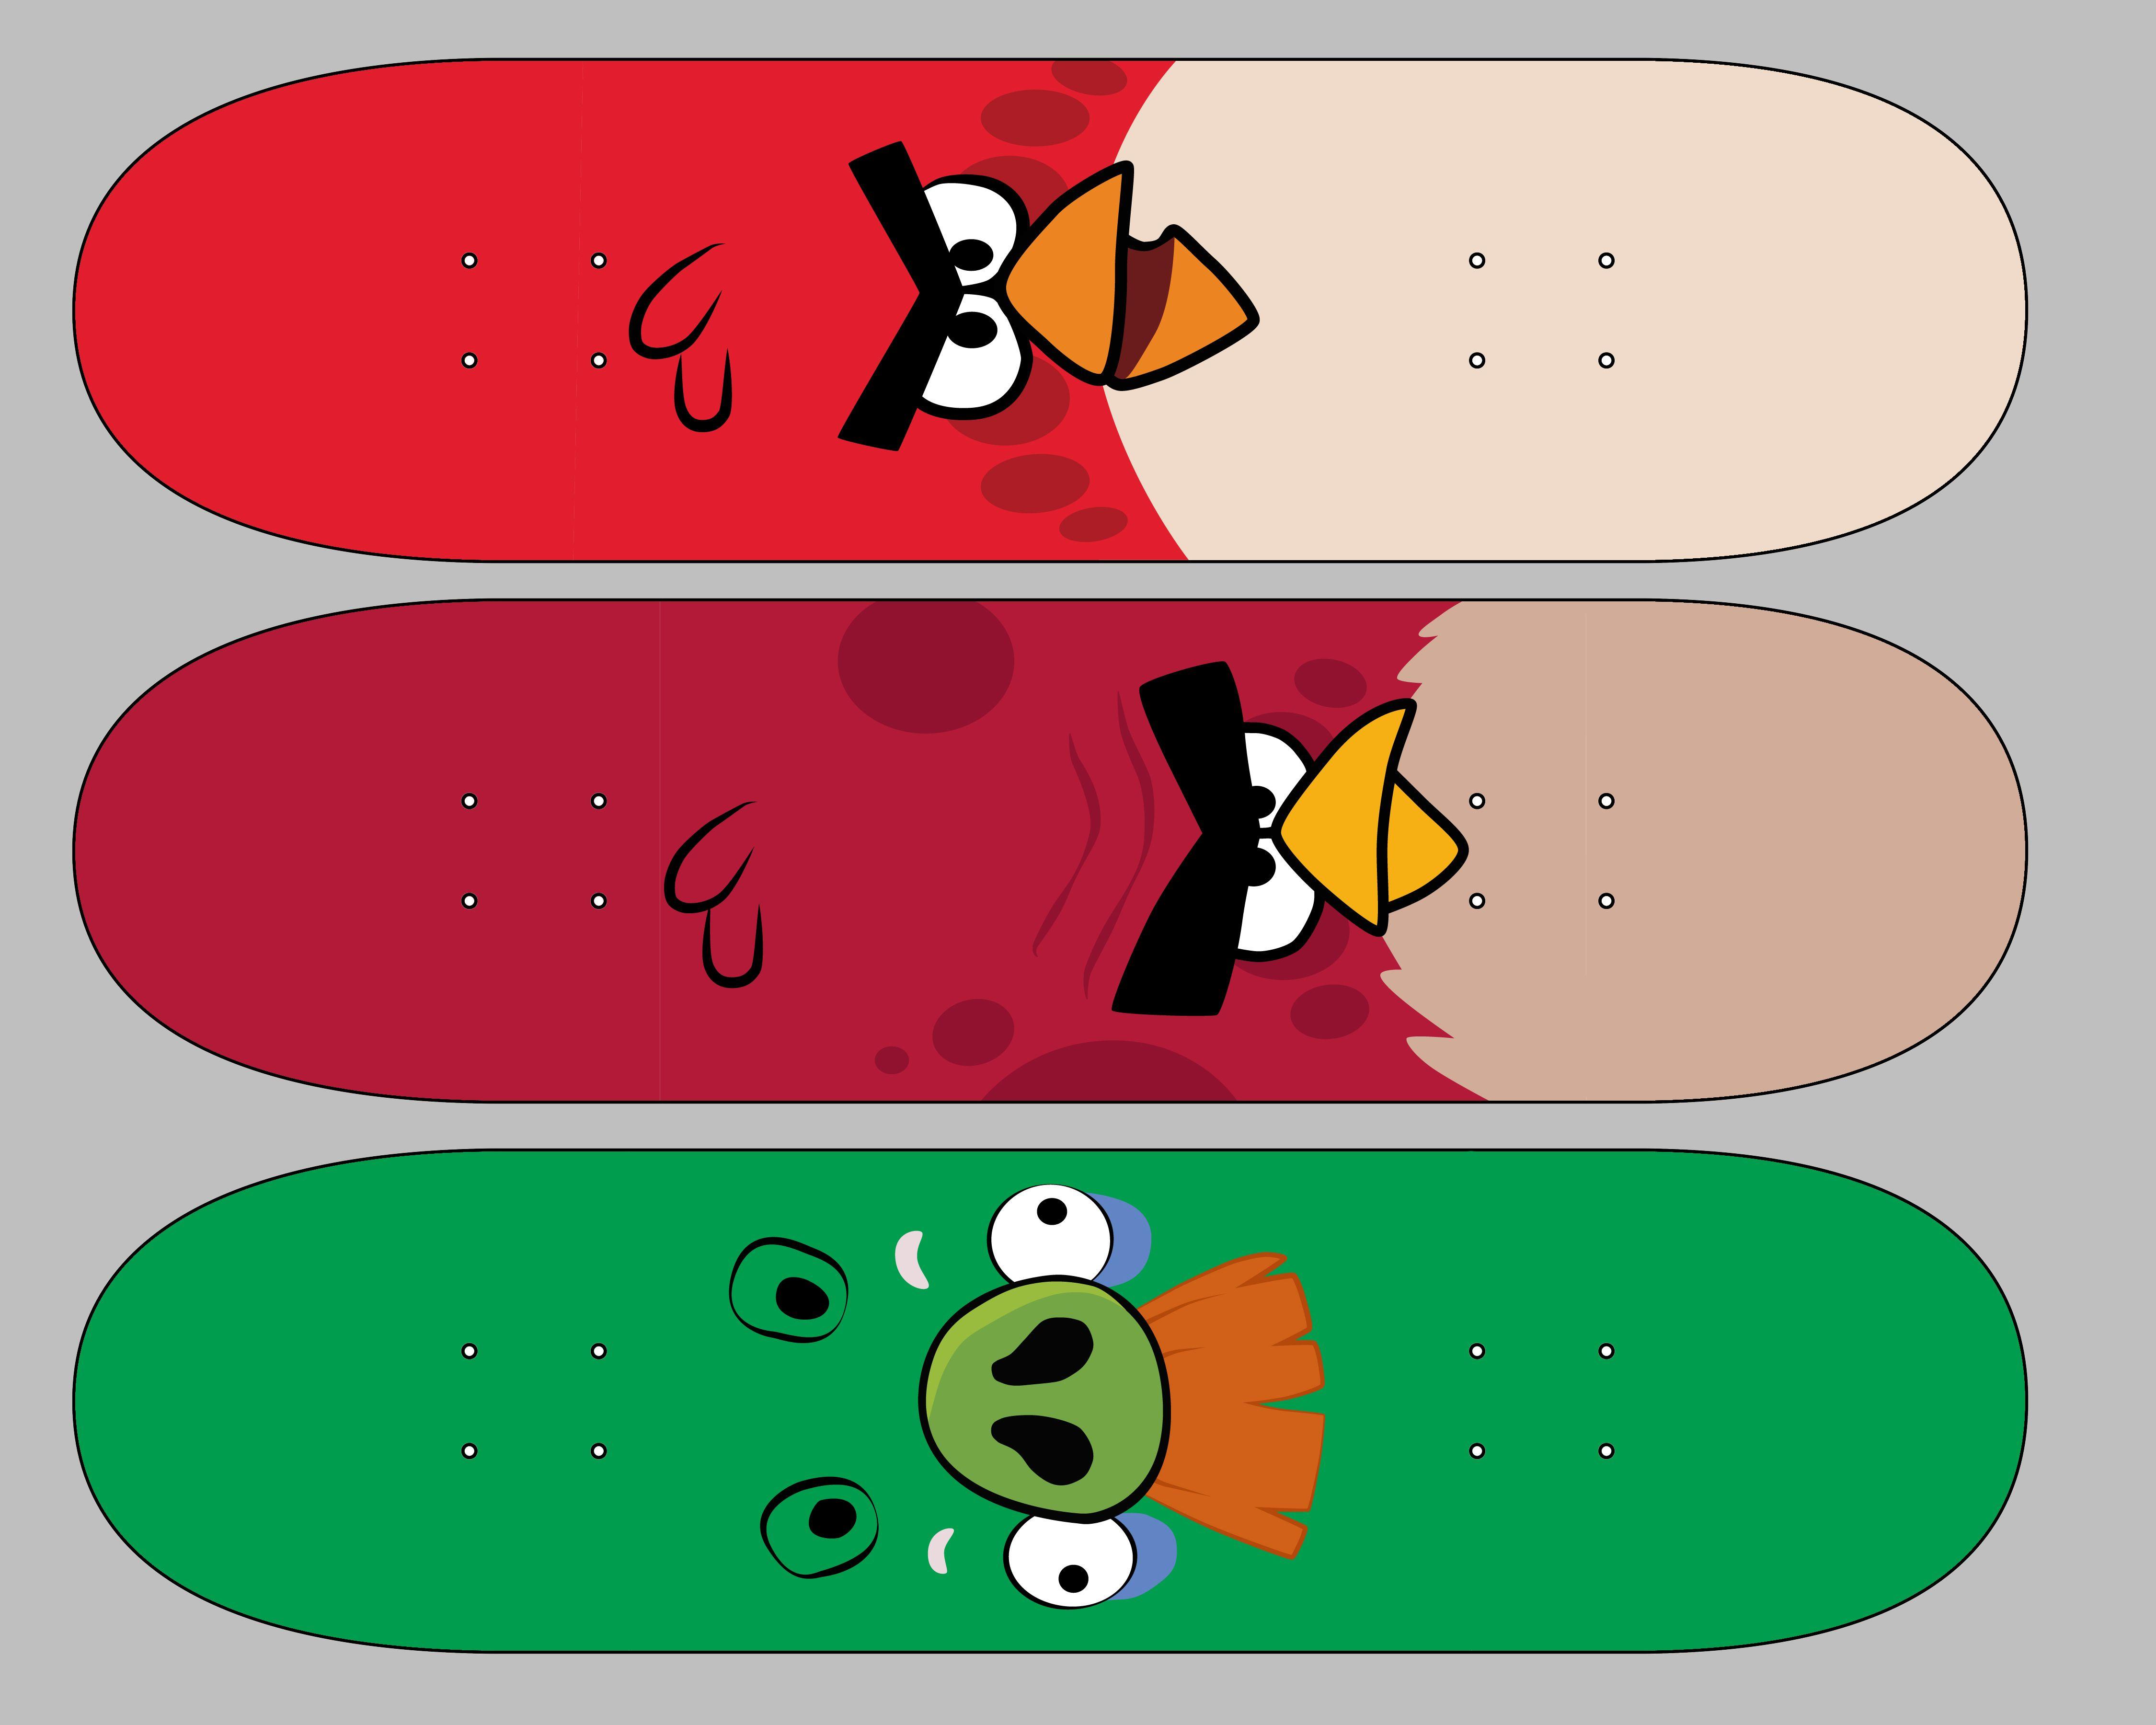 skateboard design graphics as surf skate snowboard design project r